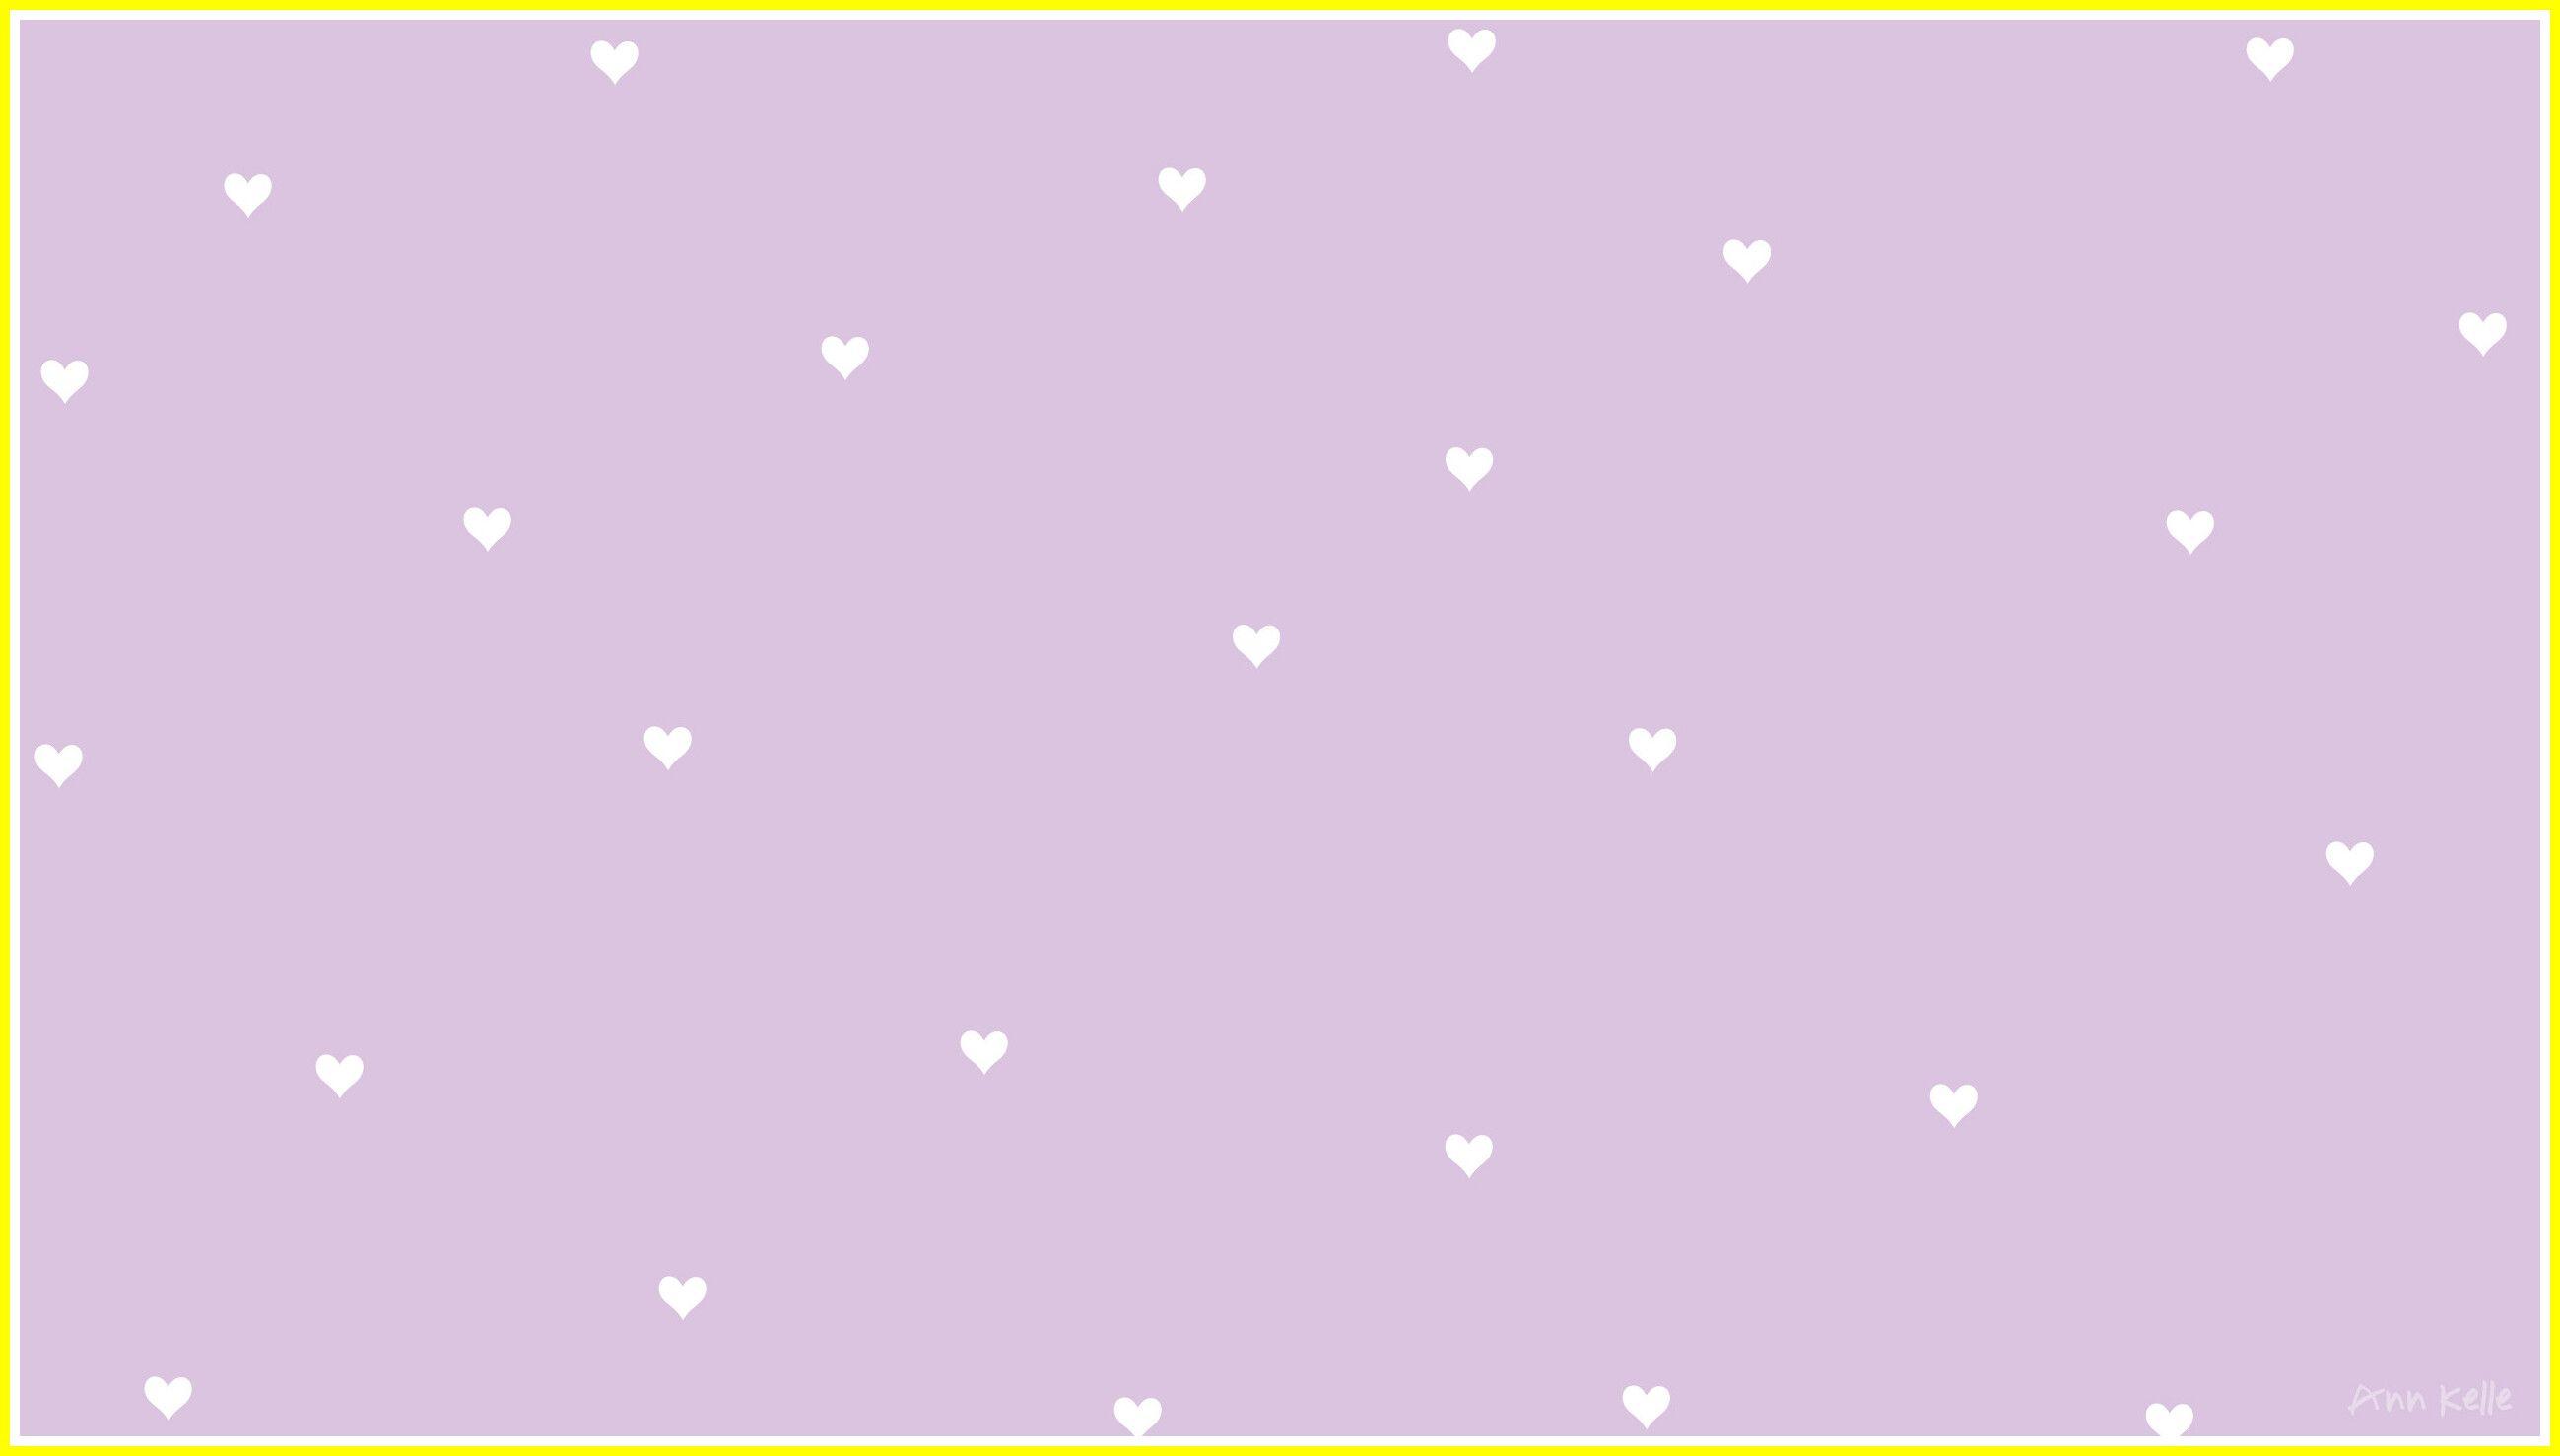 97 Reference Of Light Purple Aesthetic Wallpaper Purple Aesthetic Purple Wallpaper Light Purple Wallpaper